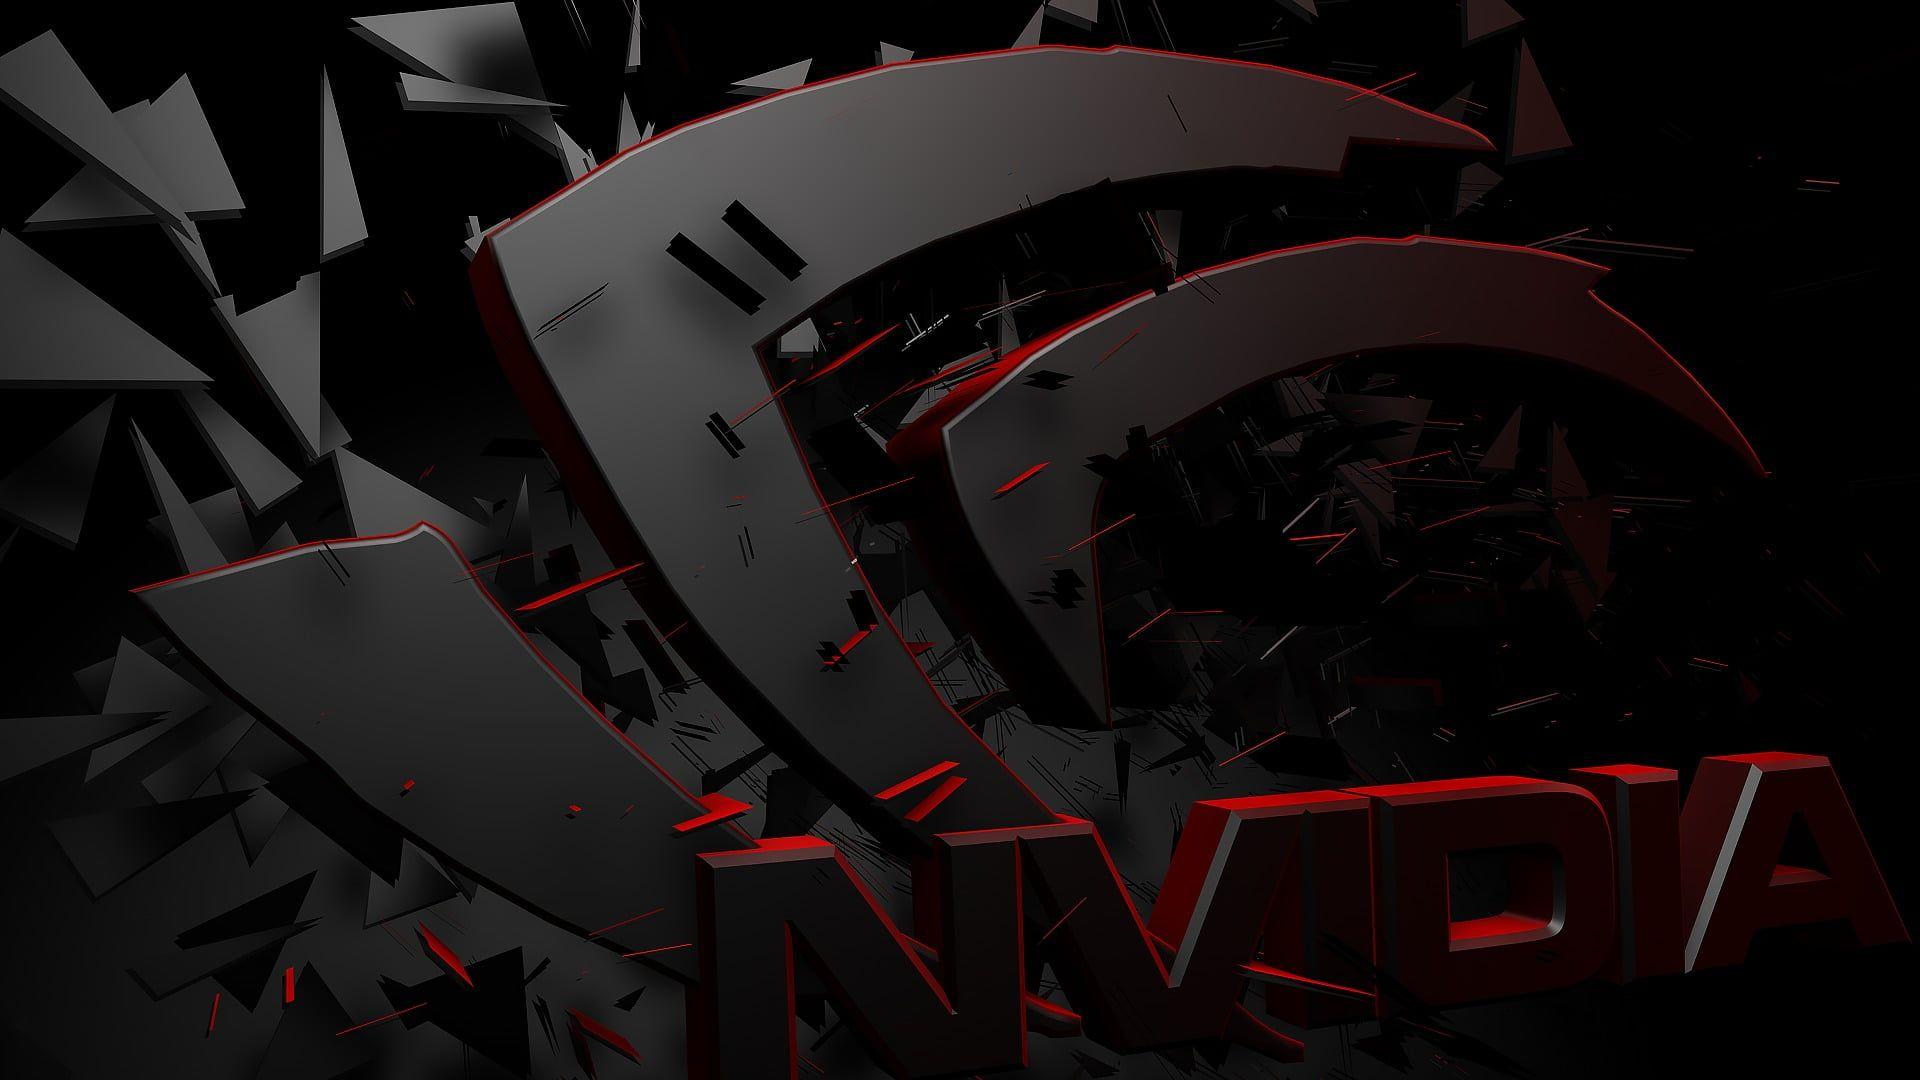 Nvdia Hd Wallpaper Nvidia Gpus Logo 3d Render 1080p Wallpaper Hdwallpaper Desktop In 2020 Red Wallpaper Hd Wallpaper Wallpaper